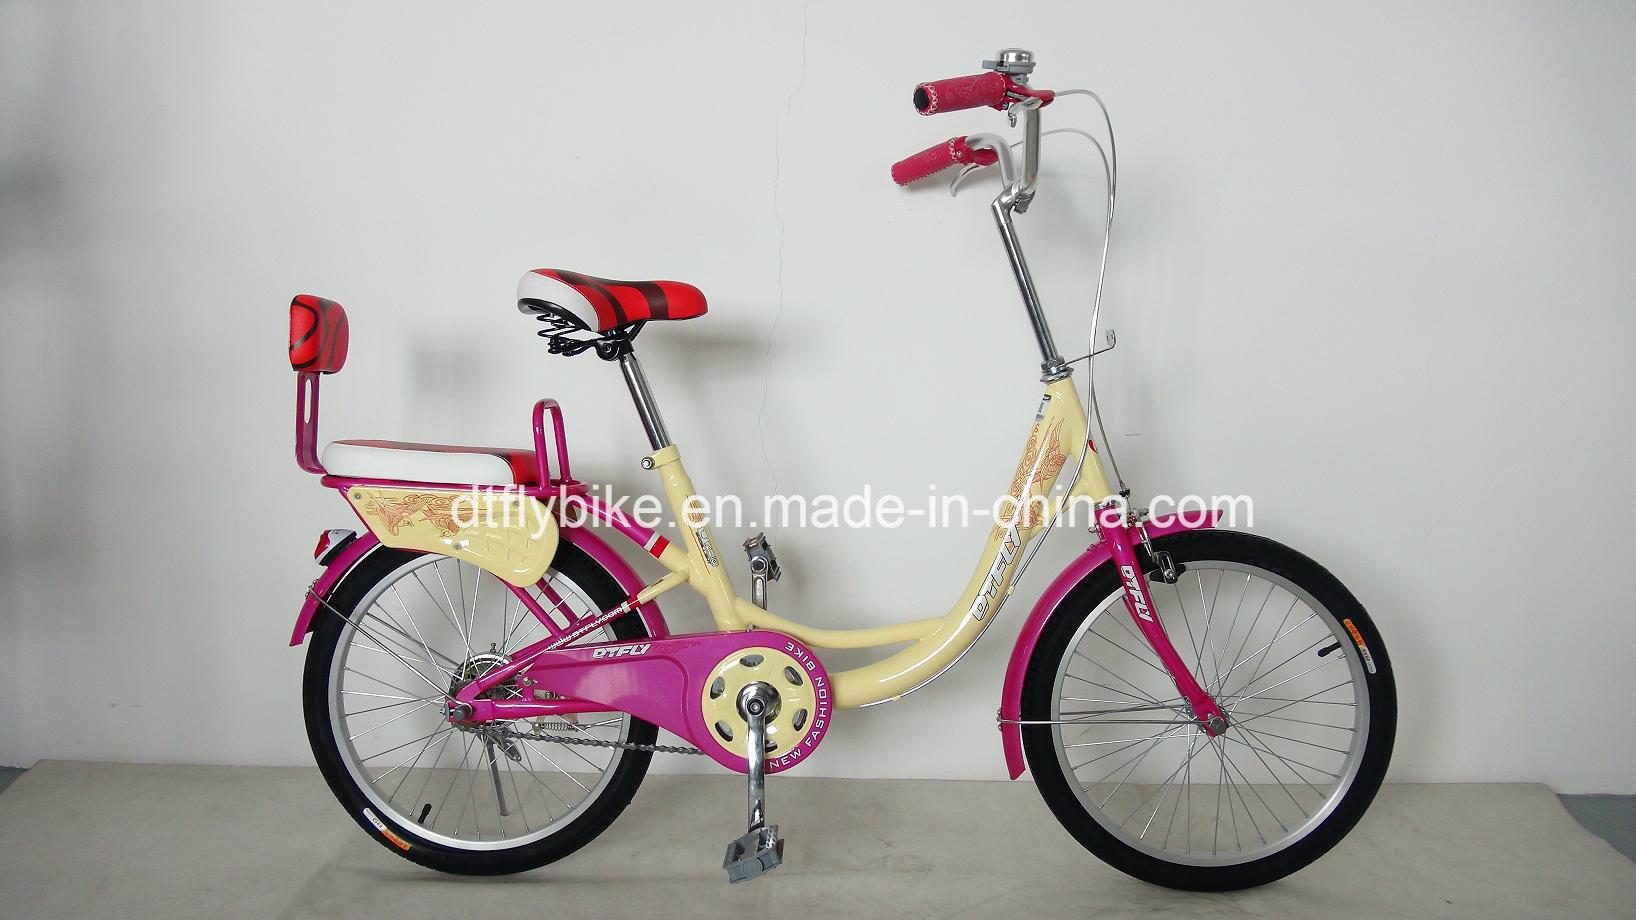 20inch Girls Bike, City Bicycle, Single Speed,